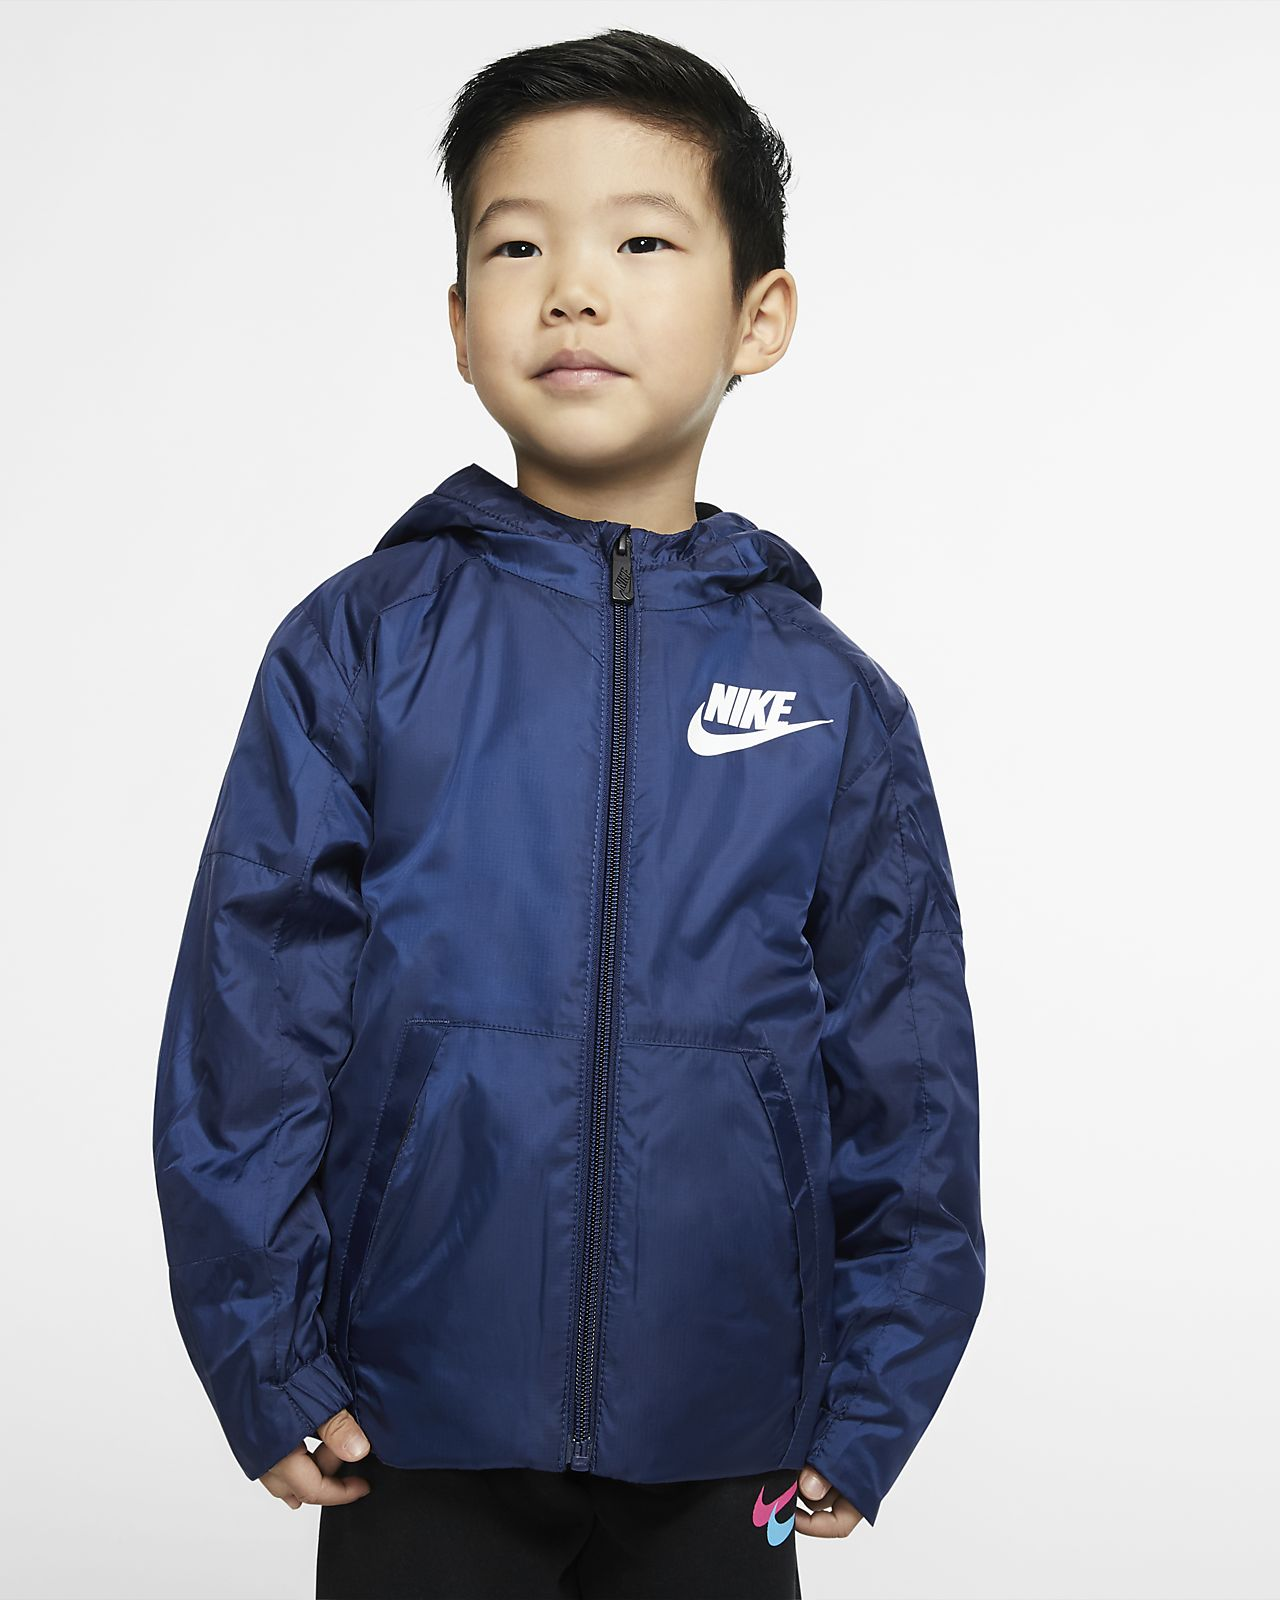 Bunda Nike Sportswear se zipem po celé délce pro batolata